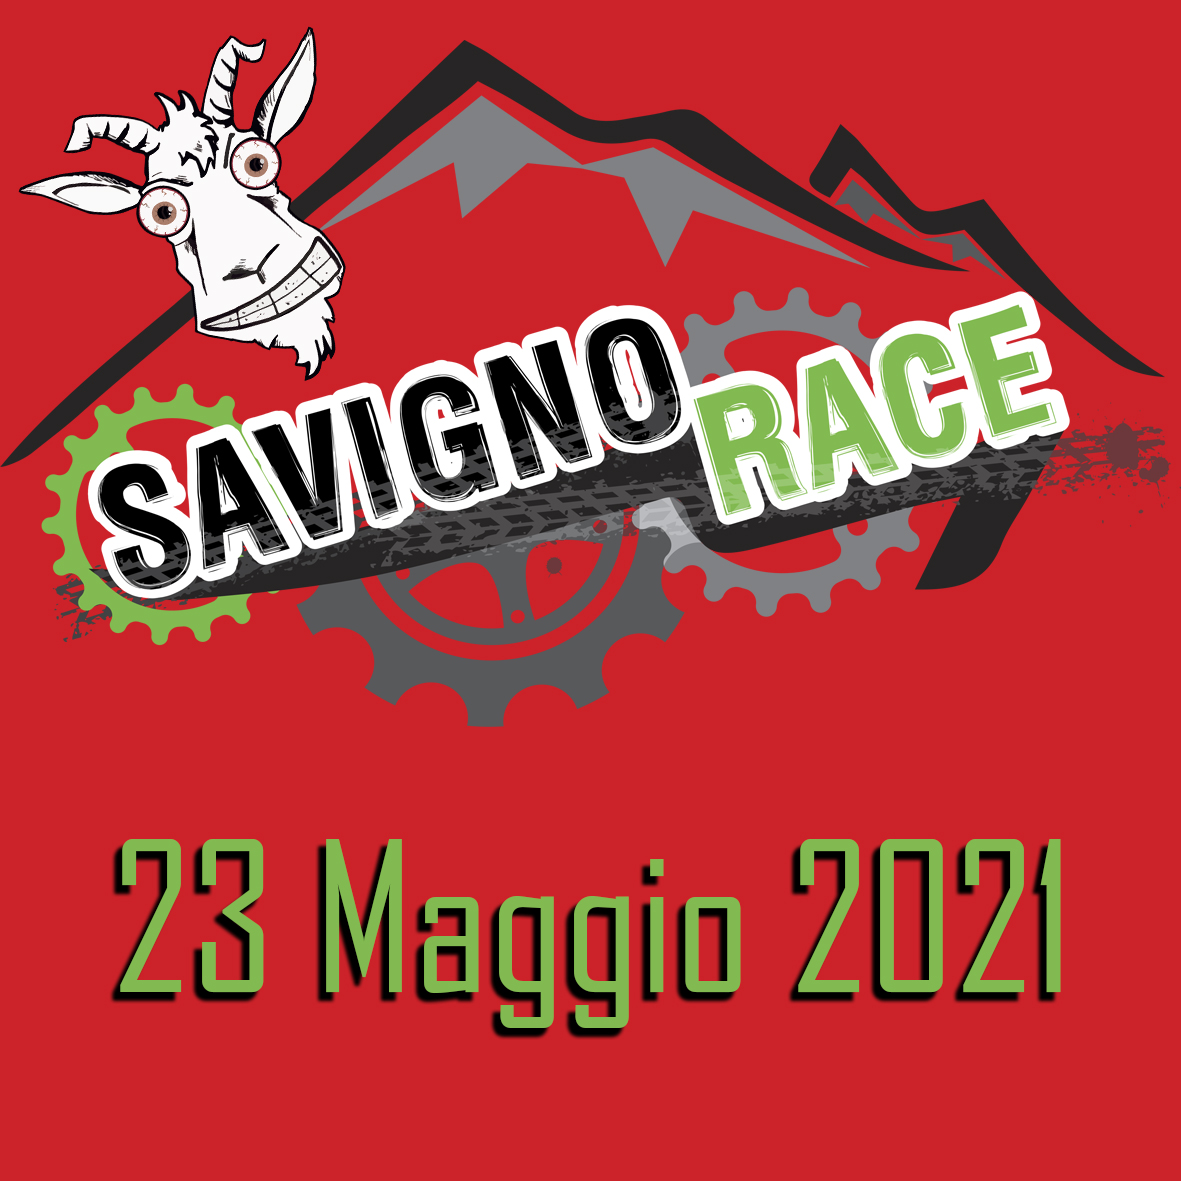 Savigno Race # 21 - Pre Gara